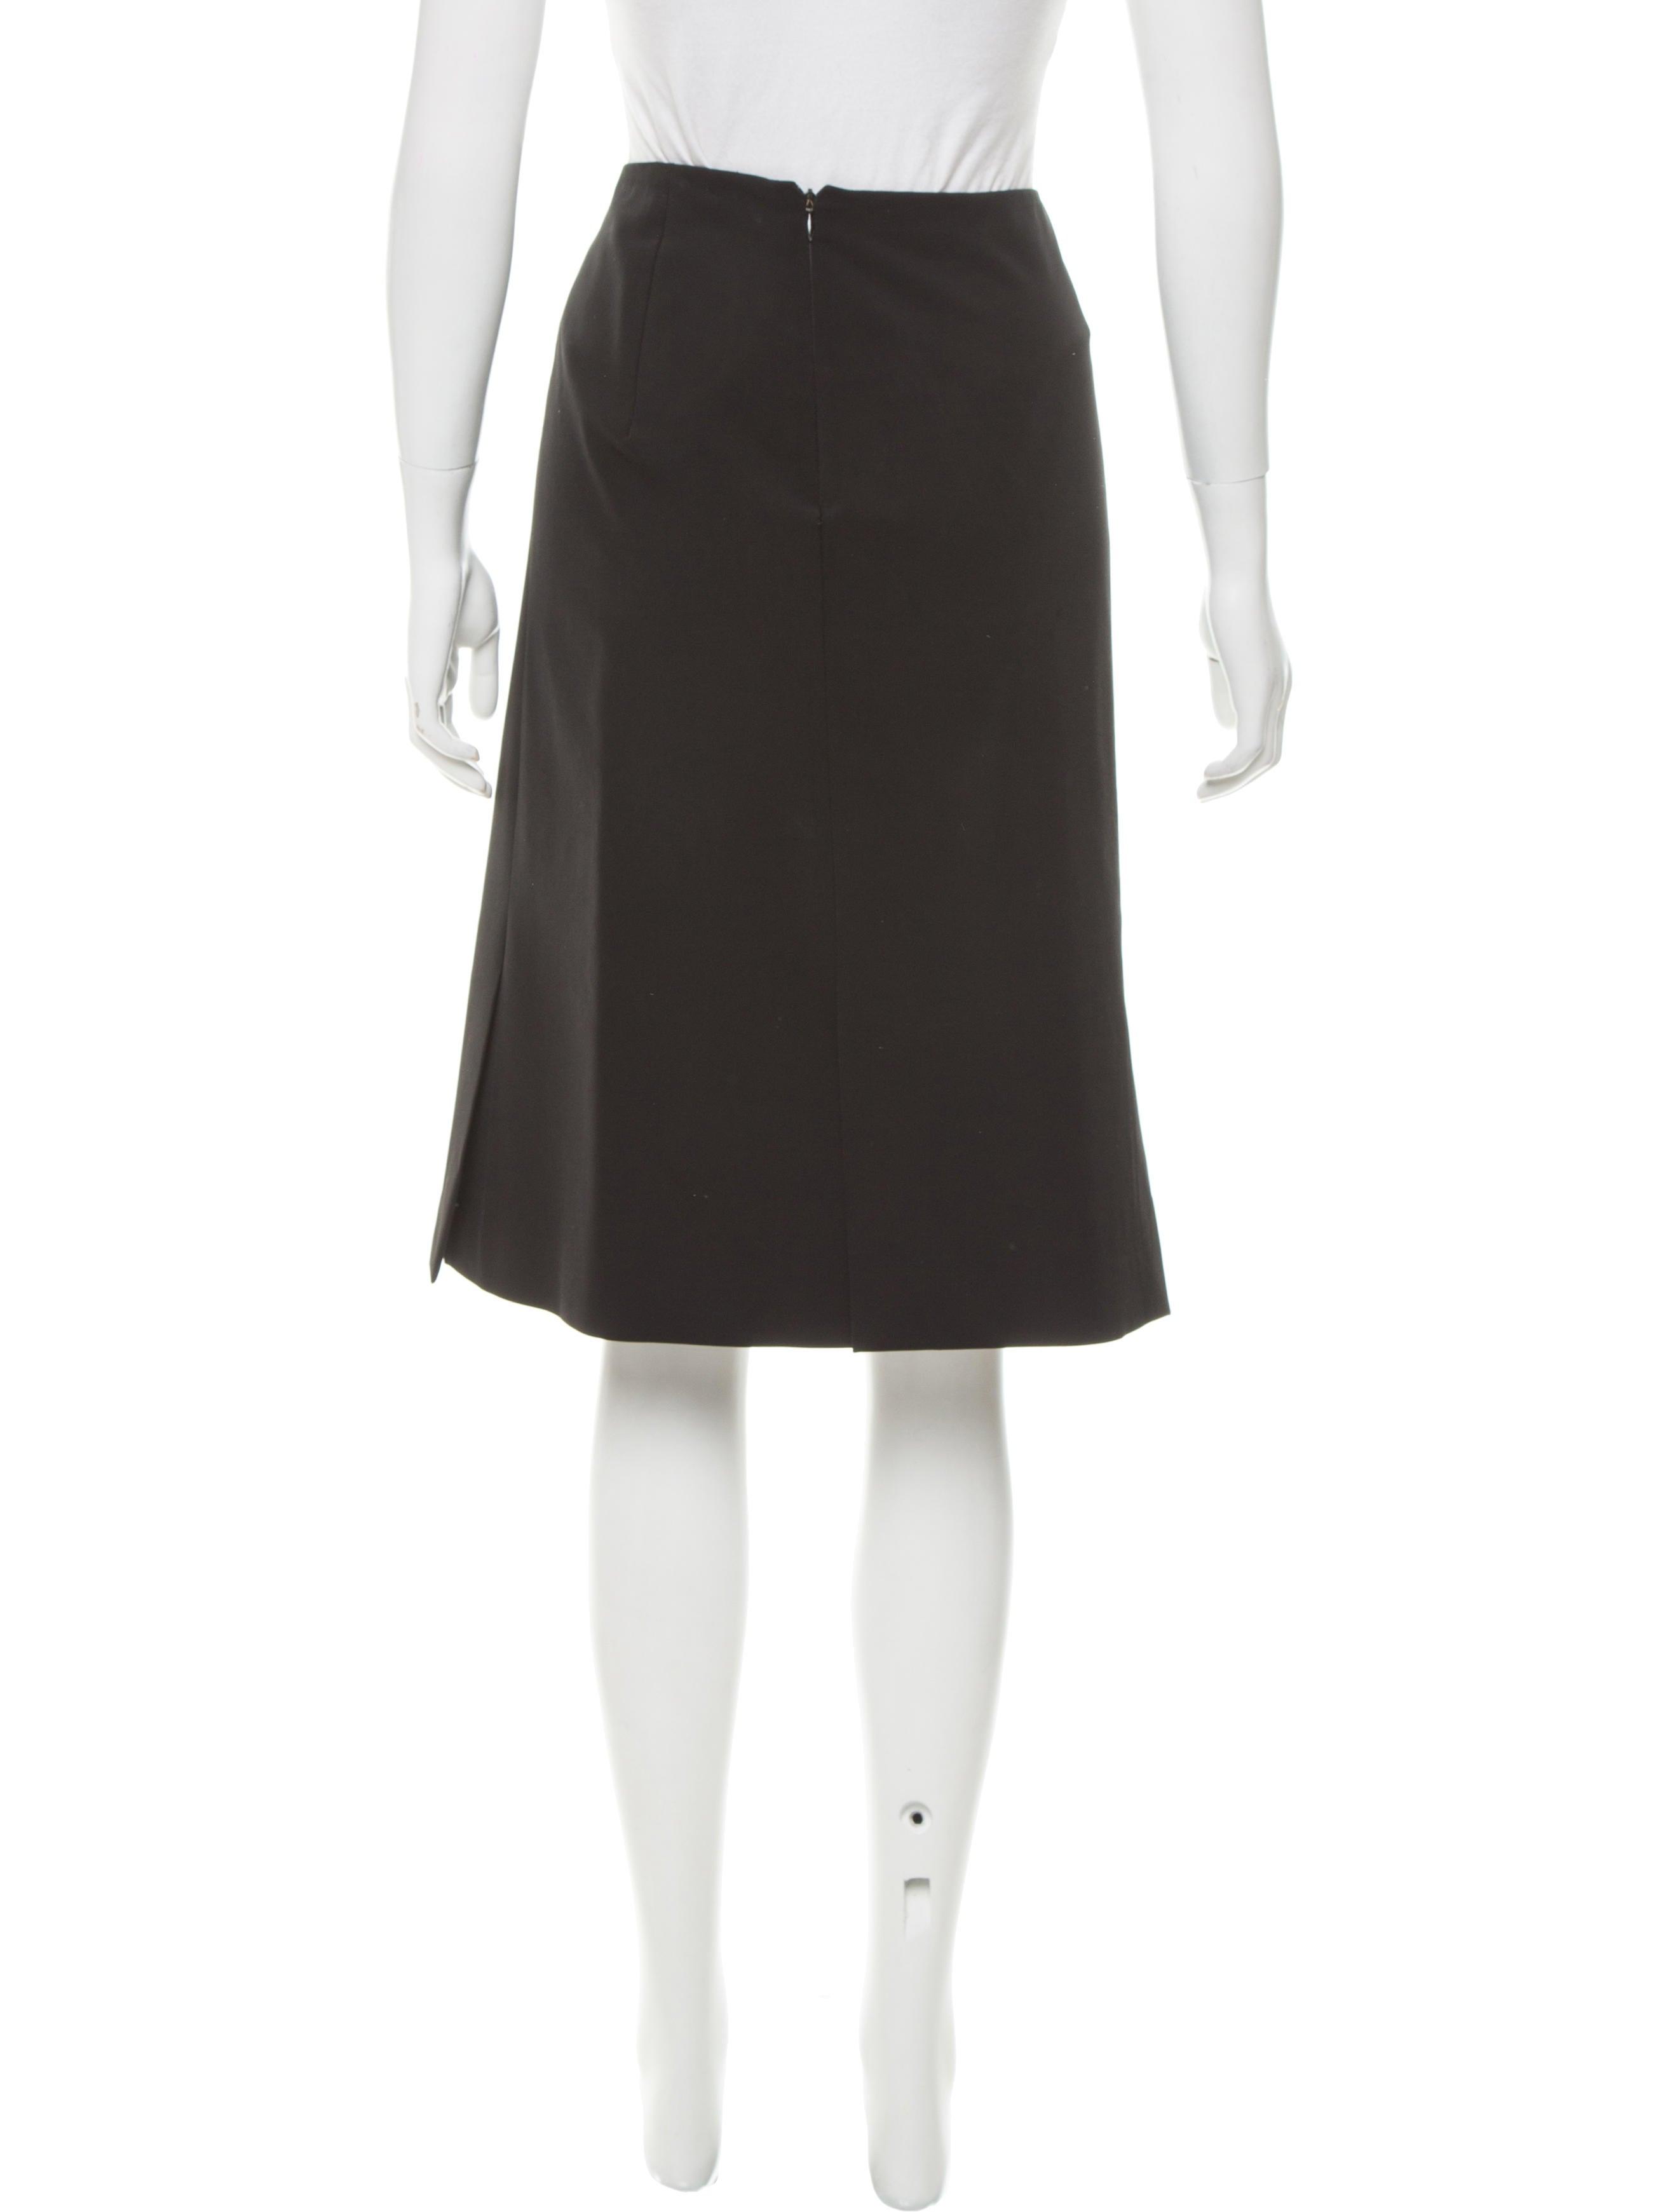 Prada Knee-Length Pencil Skirt - Skirts